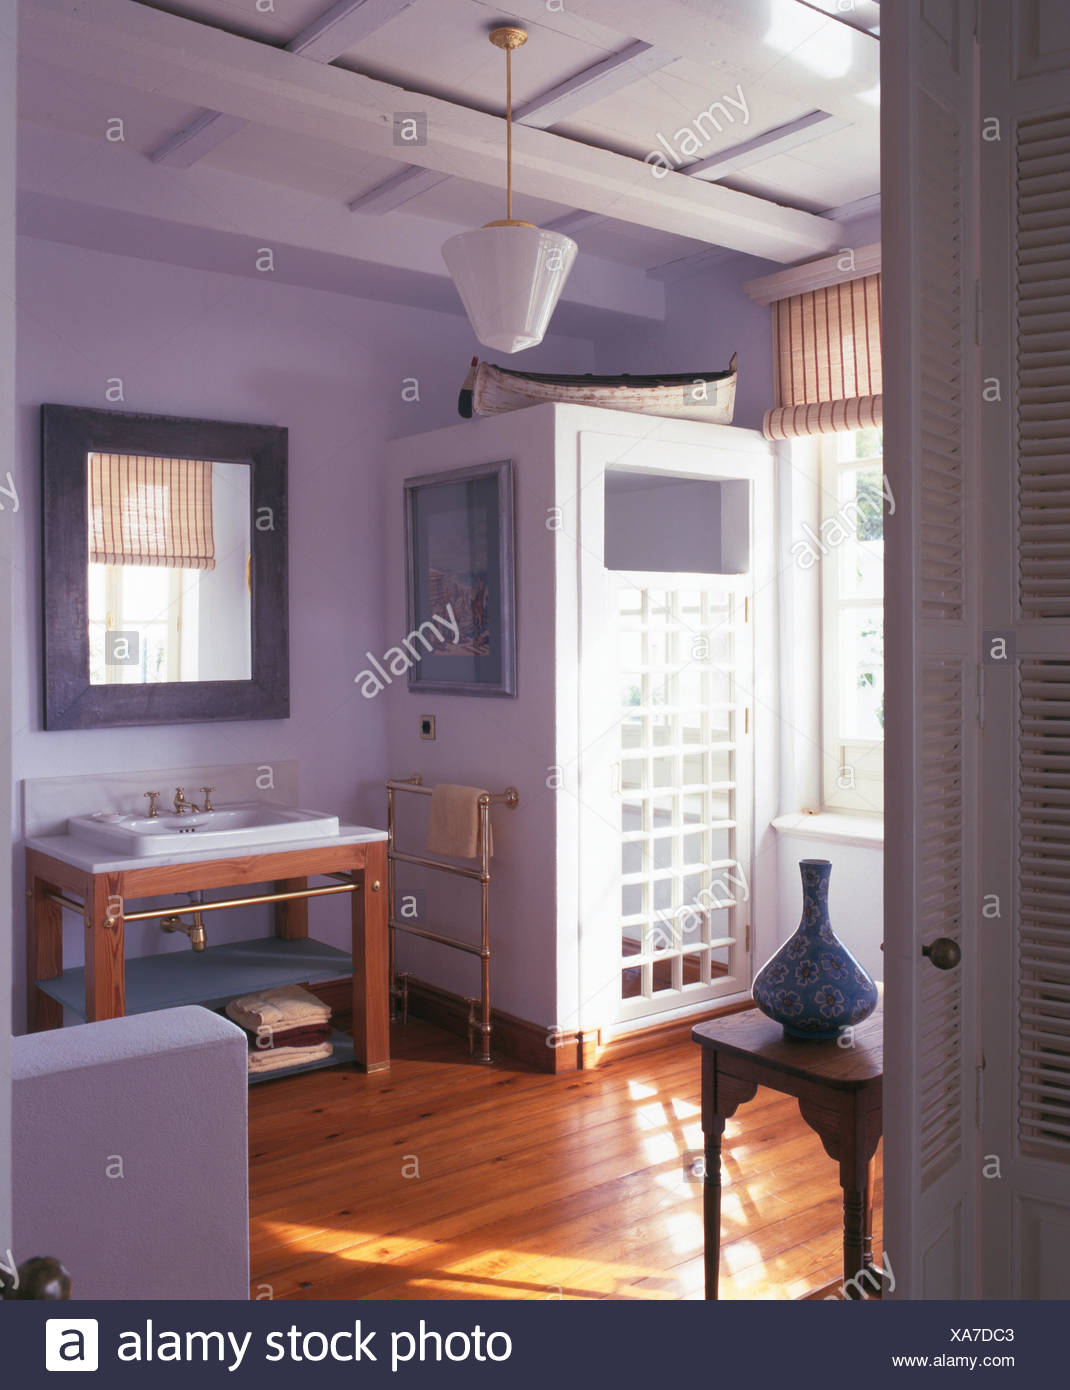 Trellis door on shower cabinet in pale blue-mauve Spanish bathroom with a wooden floor & Trellis door on shower cabinet in pale blue-mauve Spanish bathroom ...